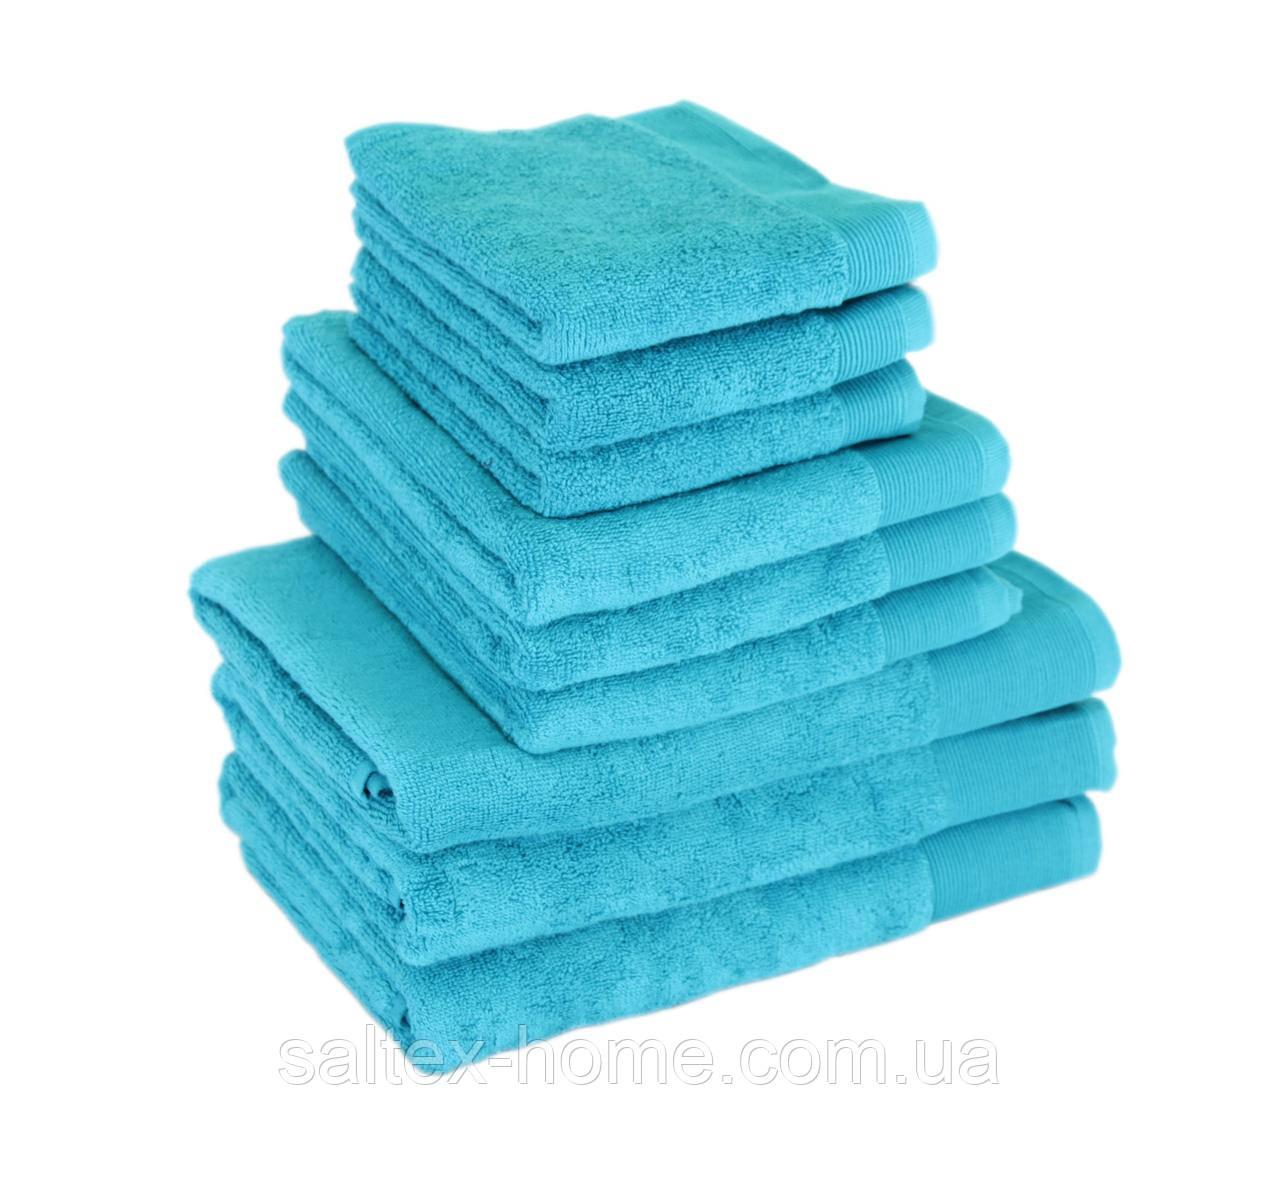 Махровое полотенце для тела 70х140см, Индия, 500 г/м, голубого цвета